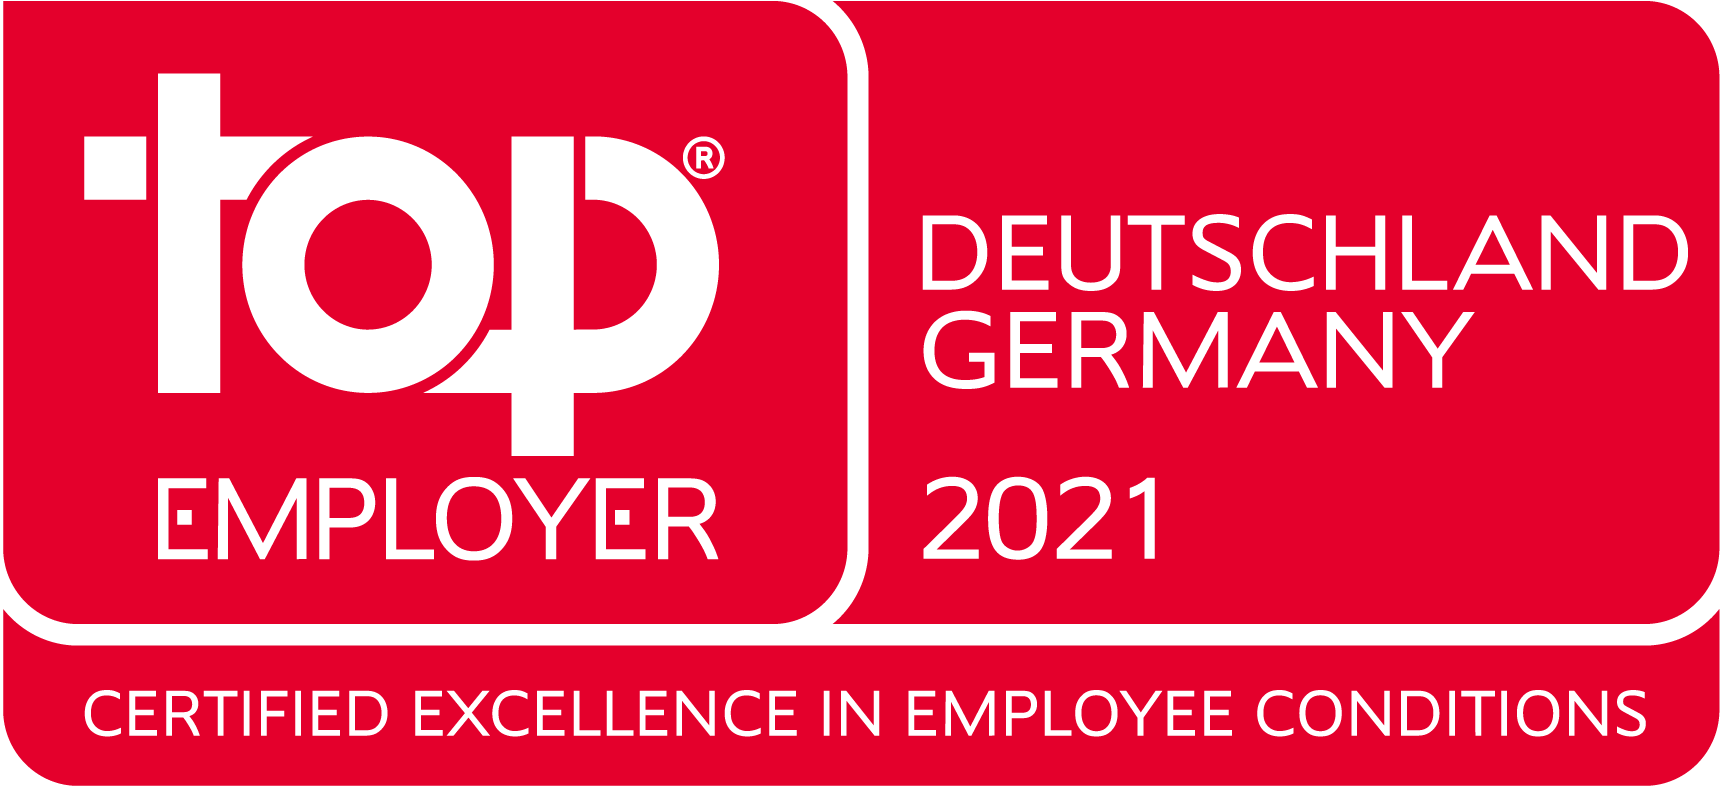 Top Employer 2021